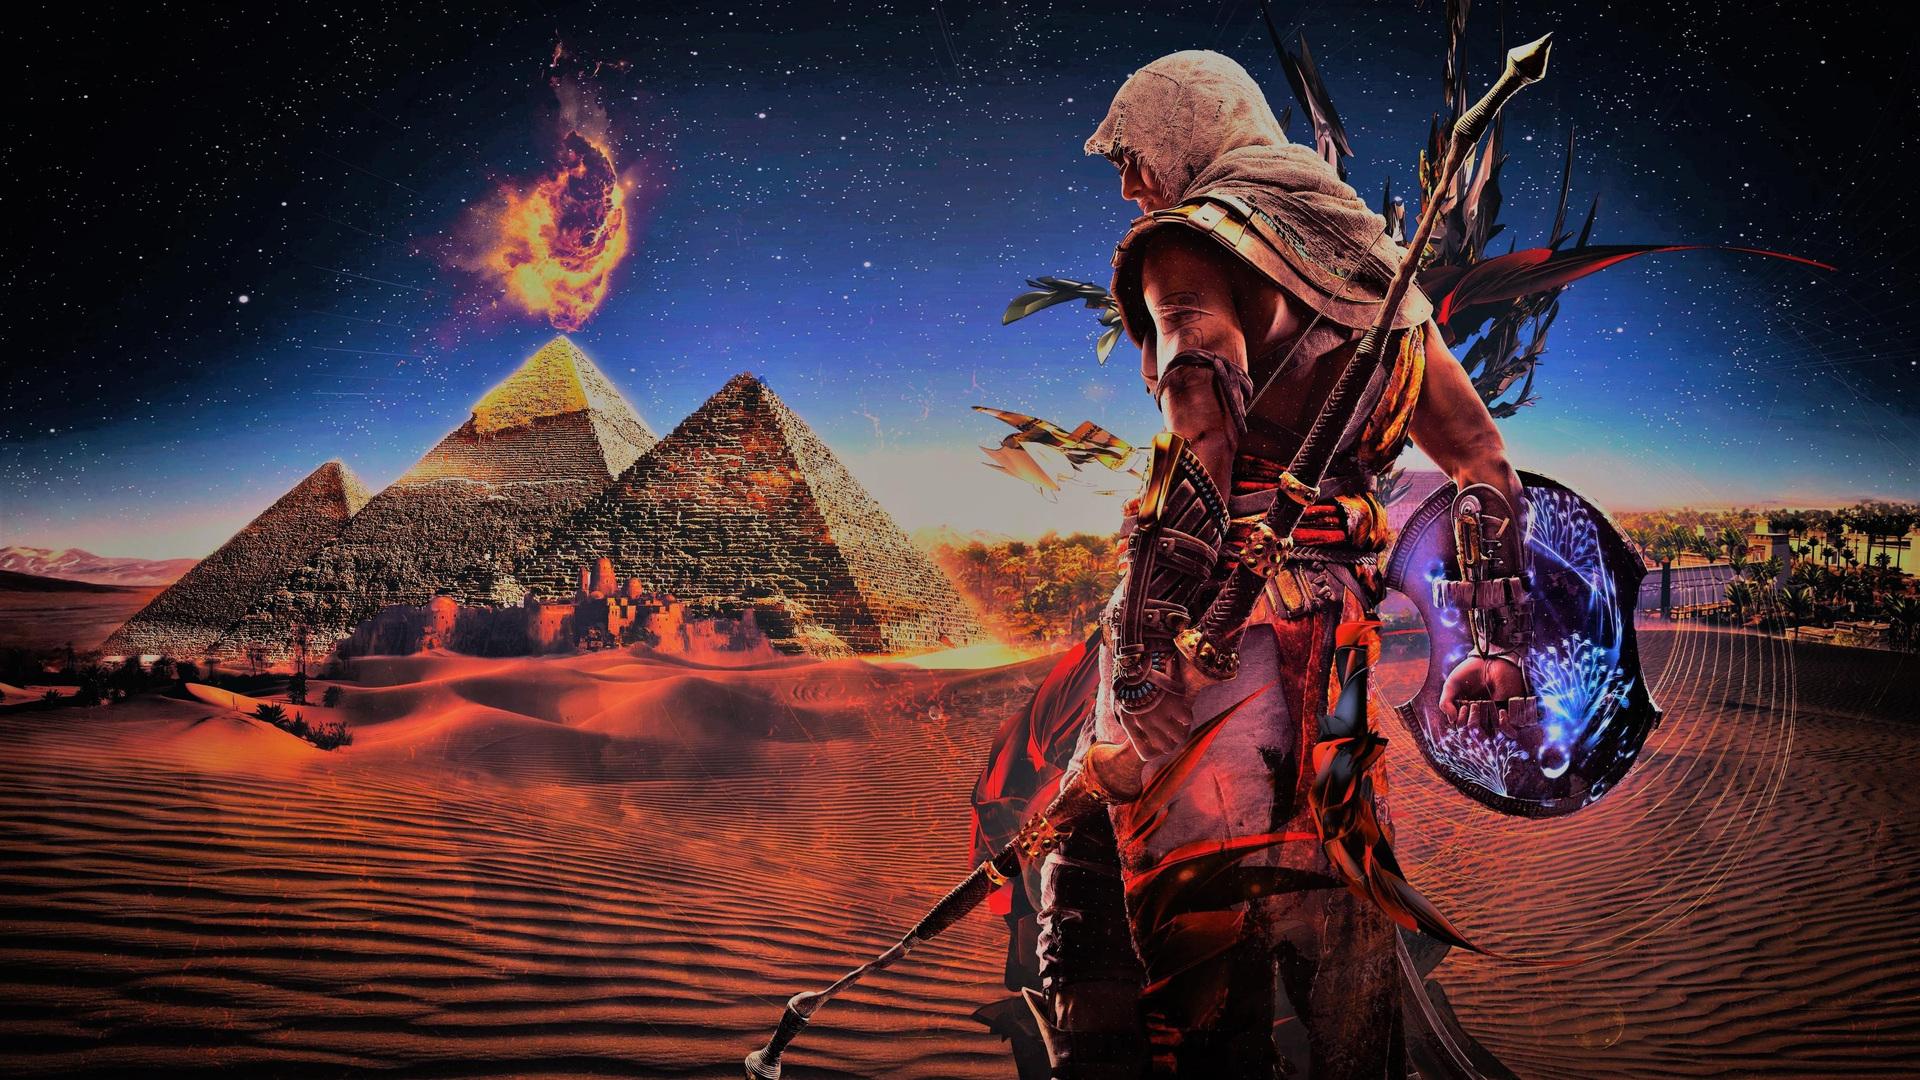 1920x1080 2018 Assassins Creed Origins 4k Laptop Full Hd 1080p Hd